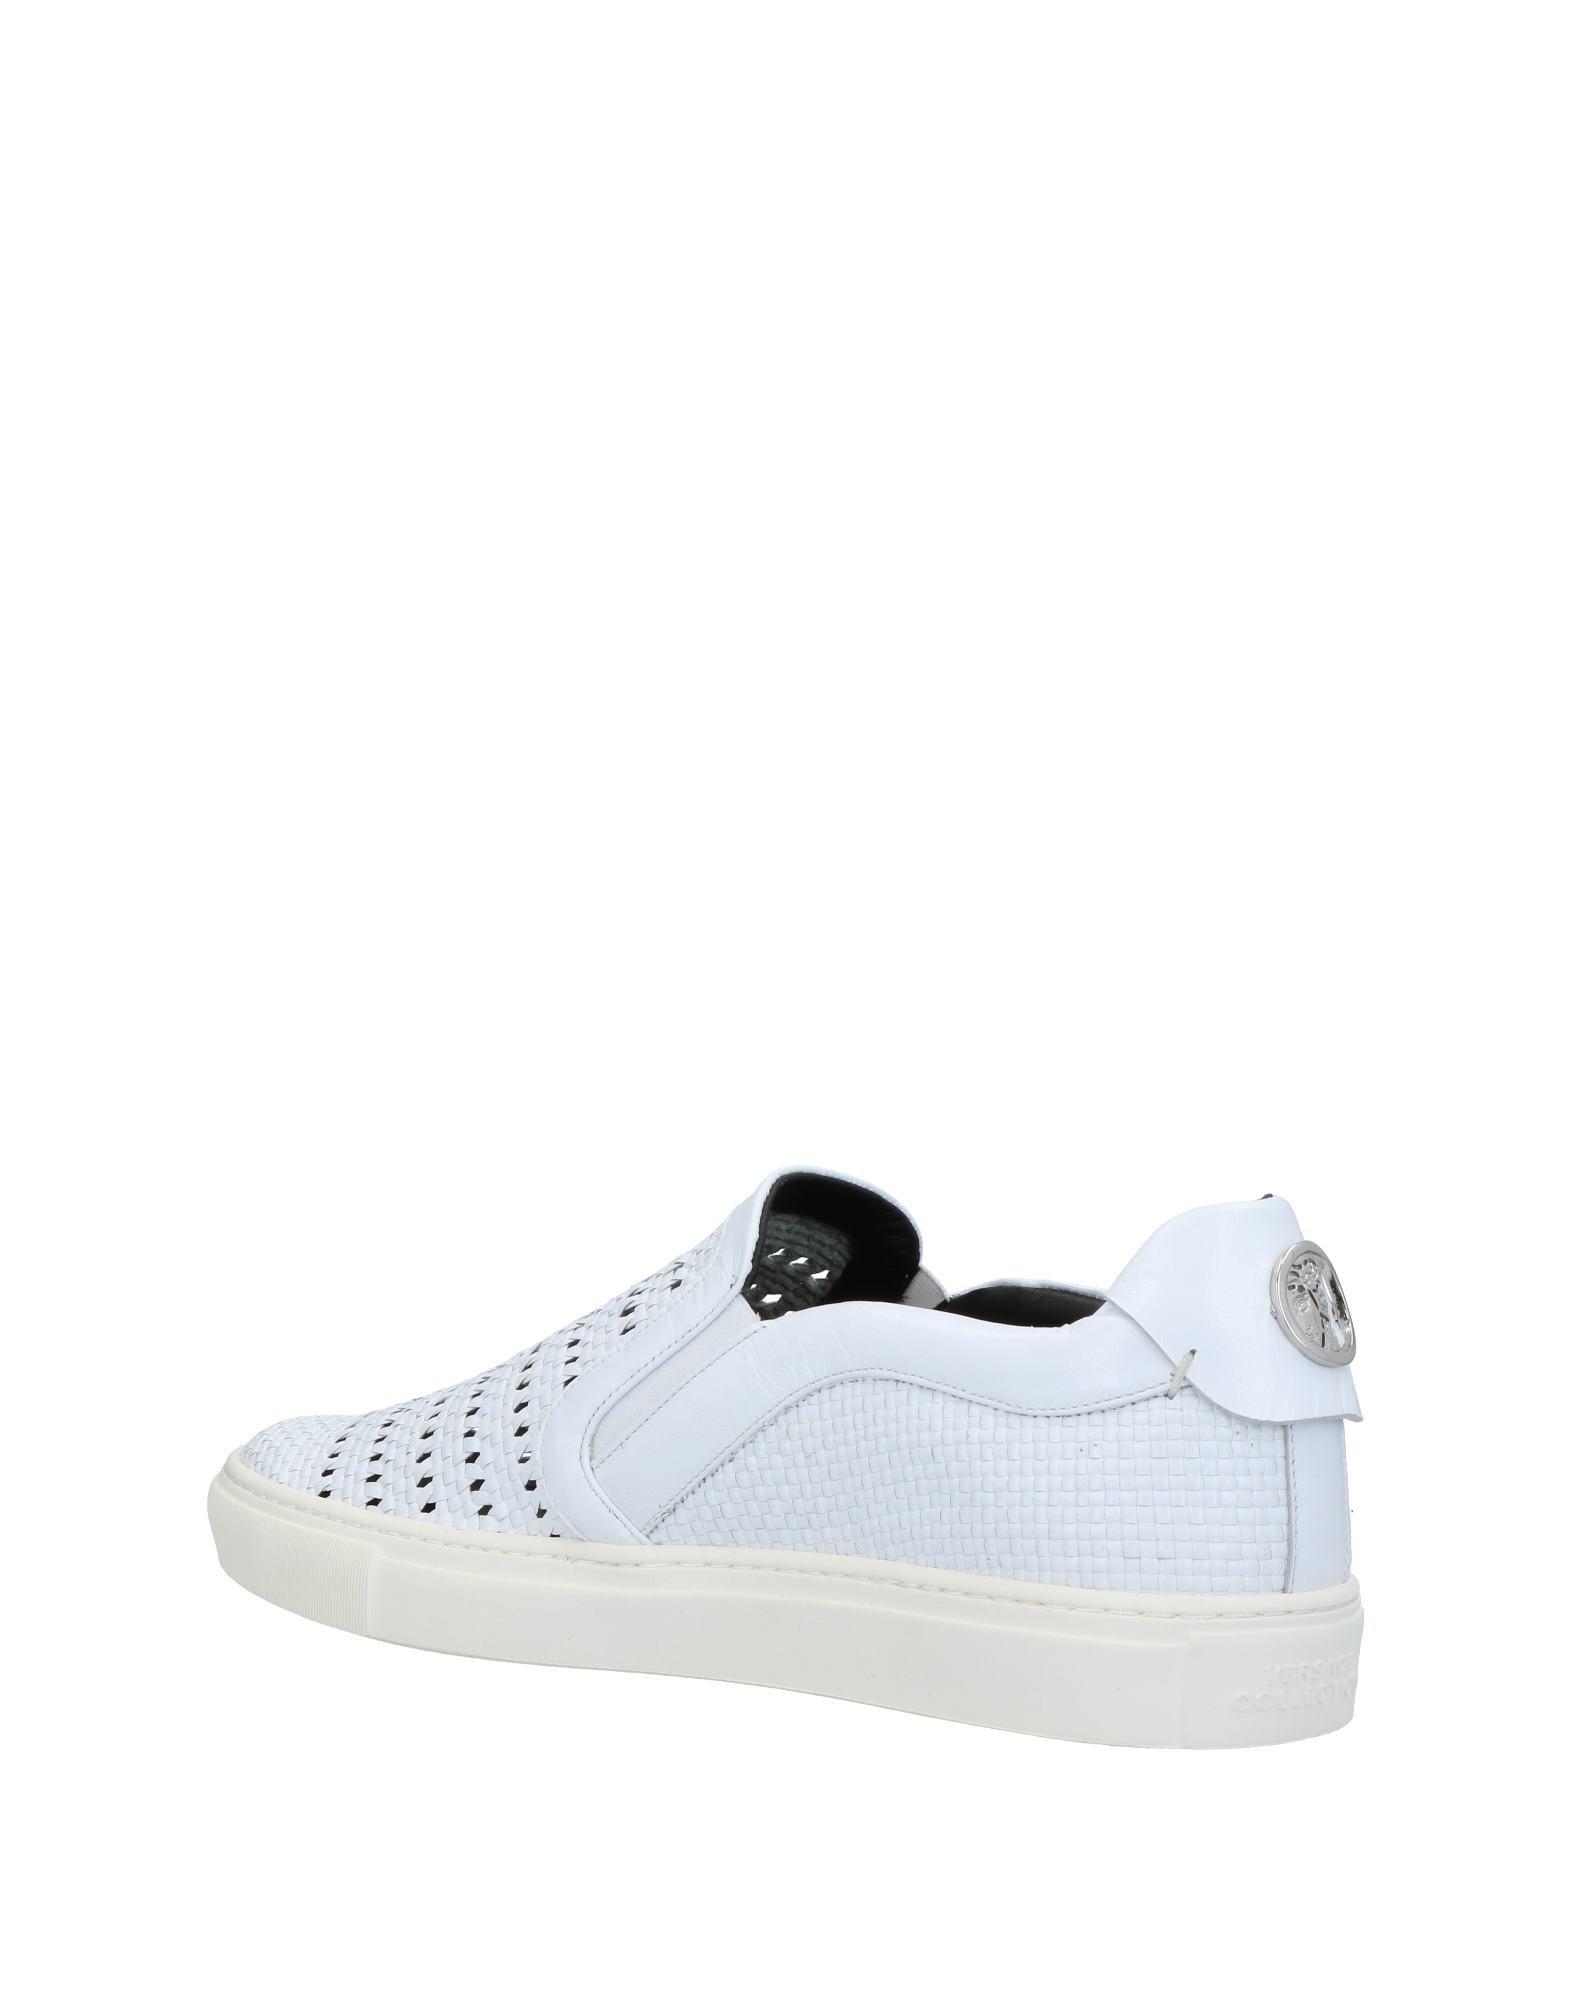 Versace Collection Sneakers Herren  Schuhe 11362569NG Gute Qualität beliebte Schuhe  e6c1df